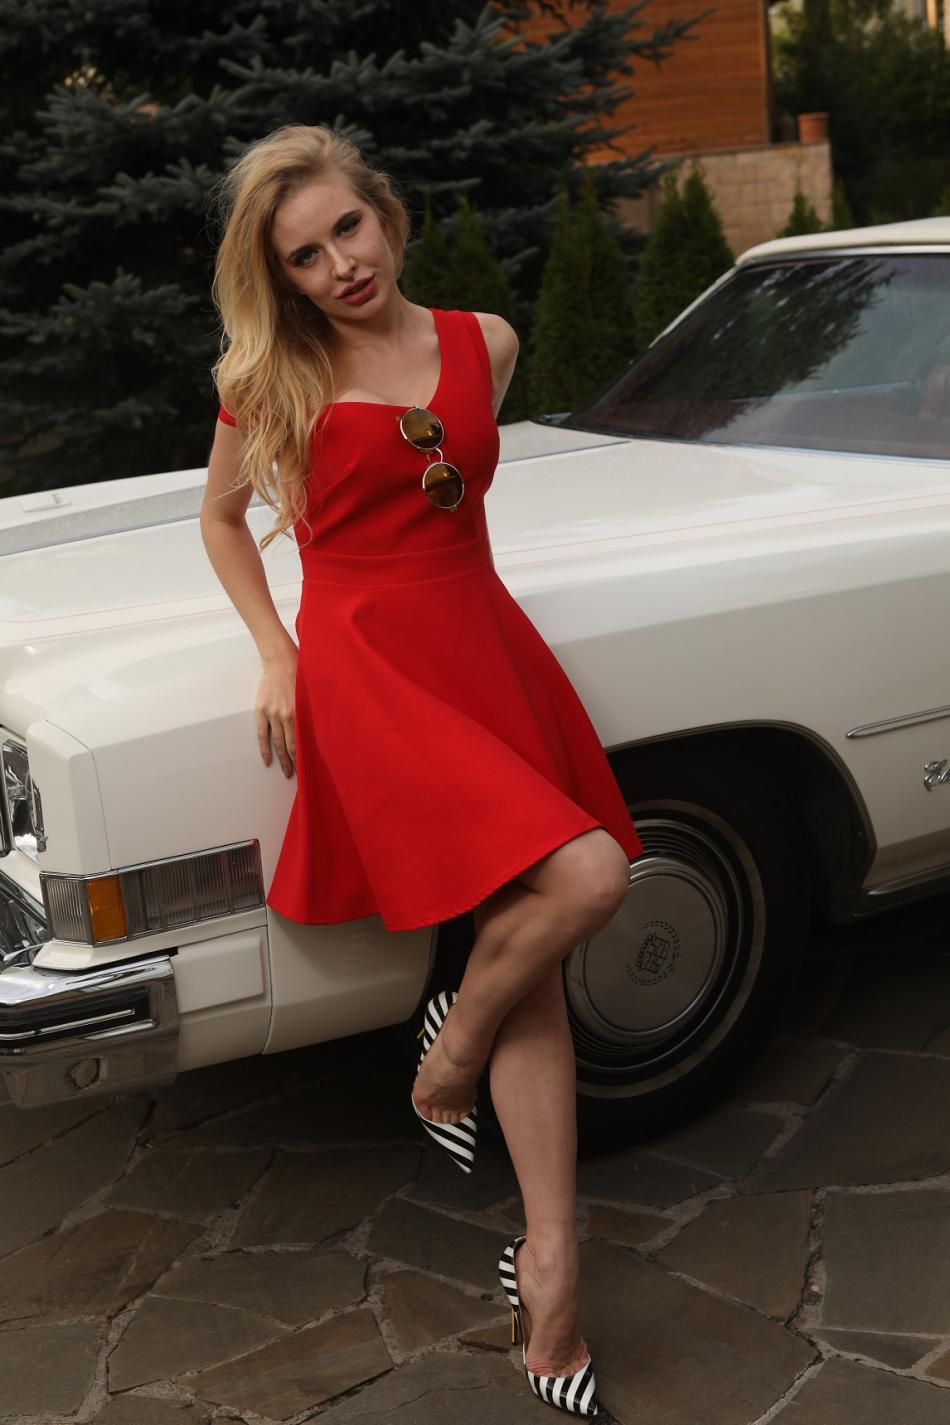 Ladyfordaddy.com Anisha Escort Girl In New York 24075840 - 5 5